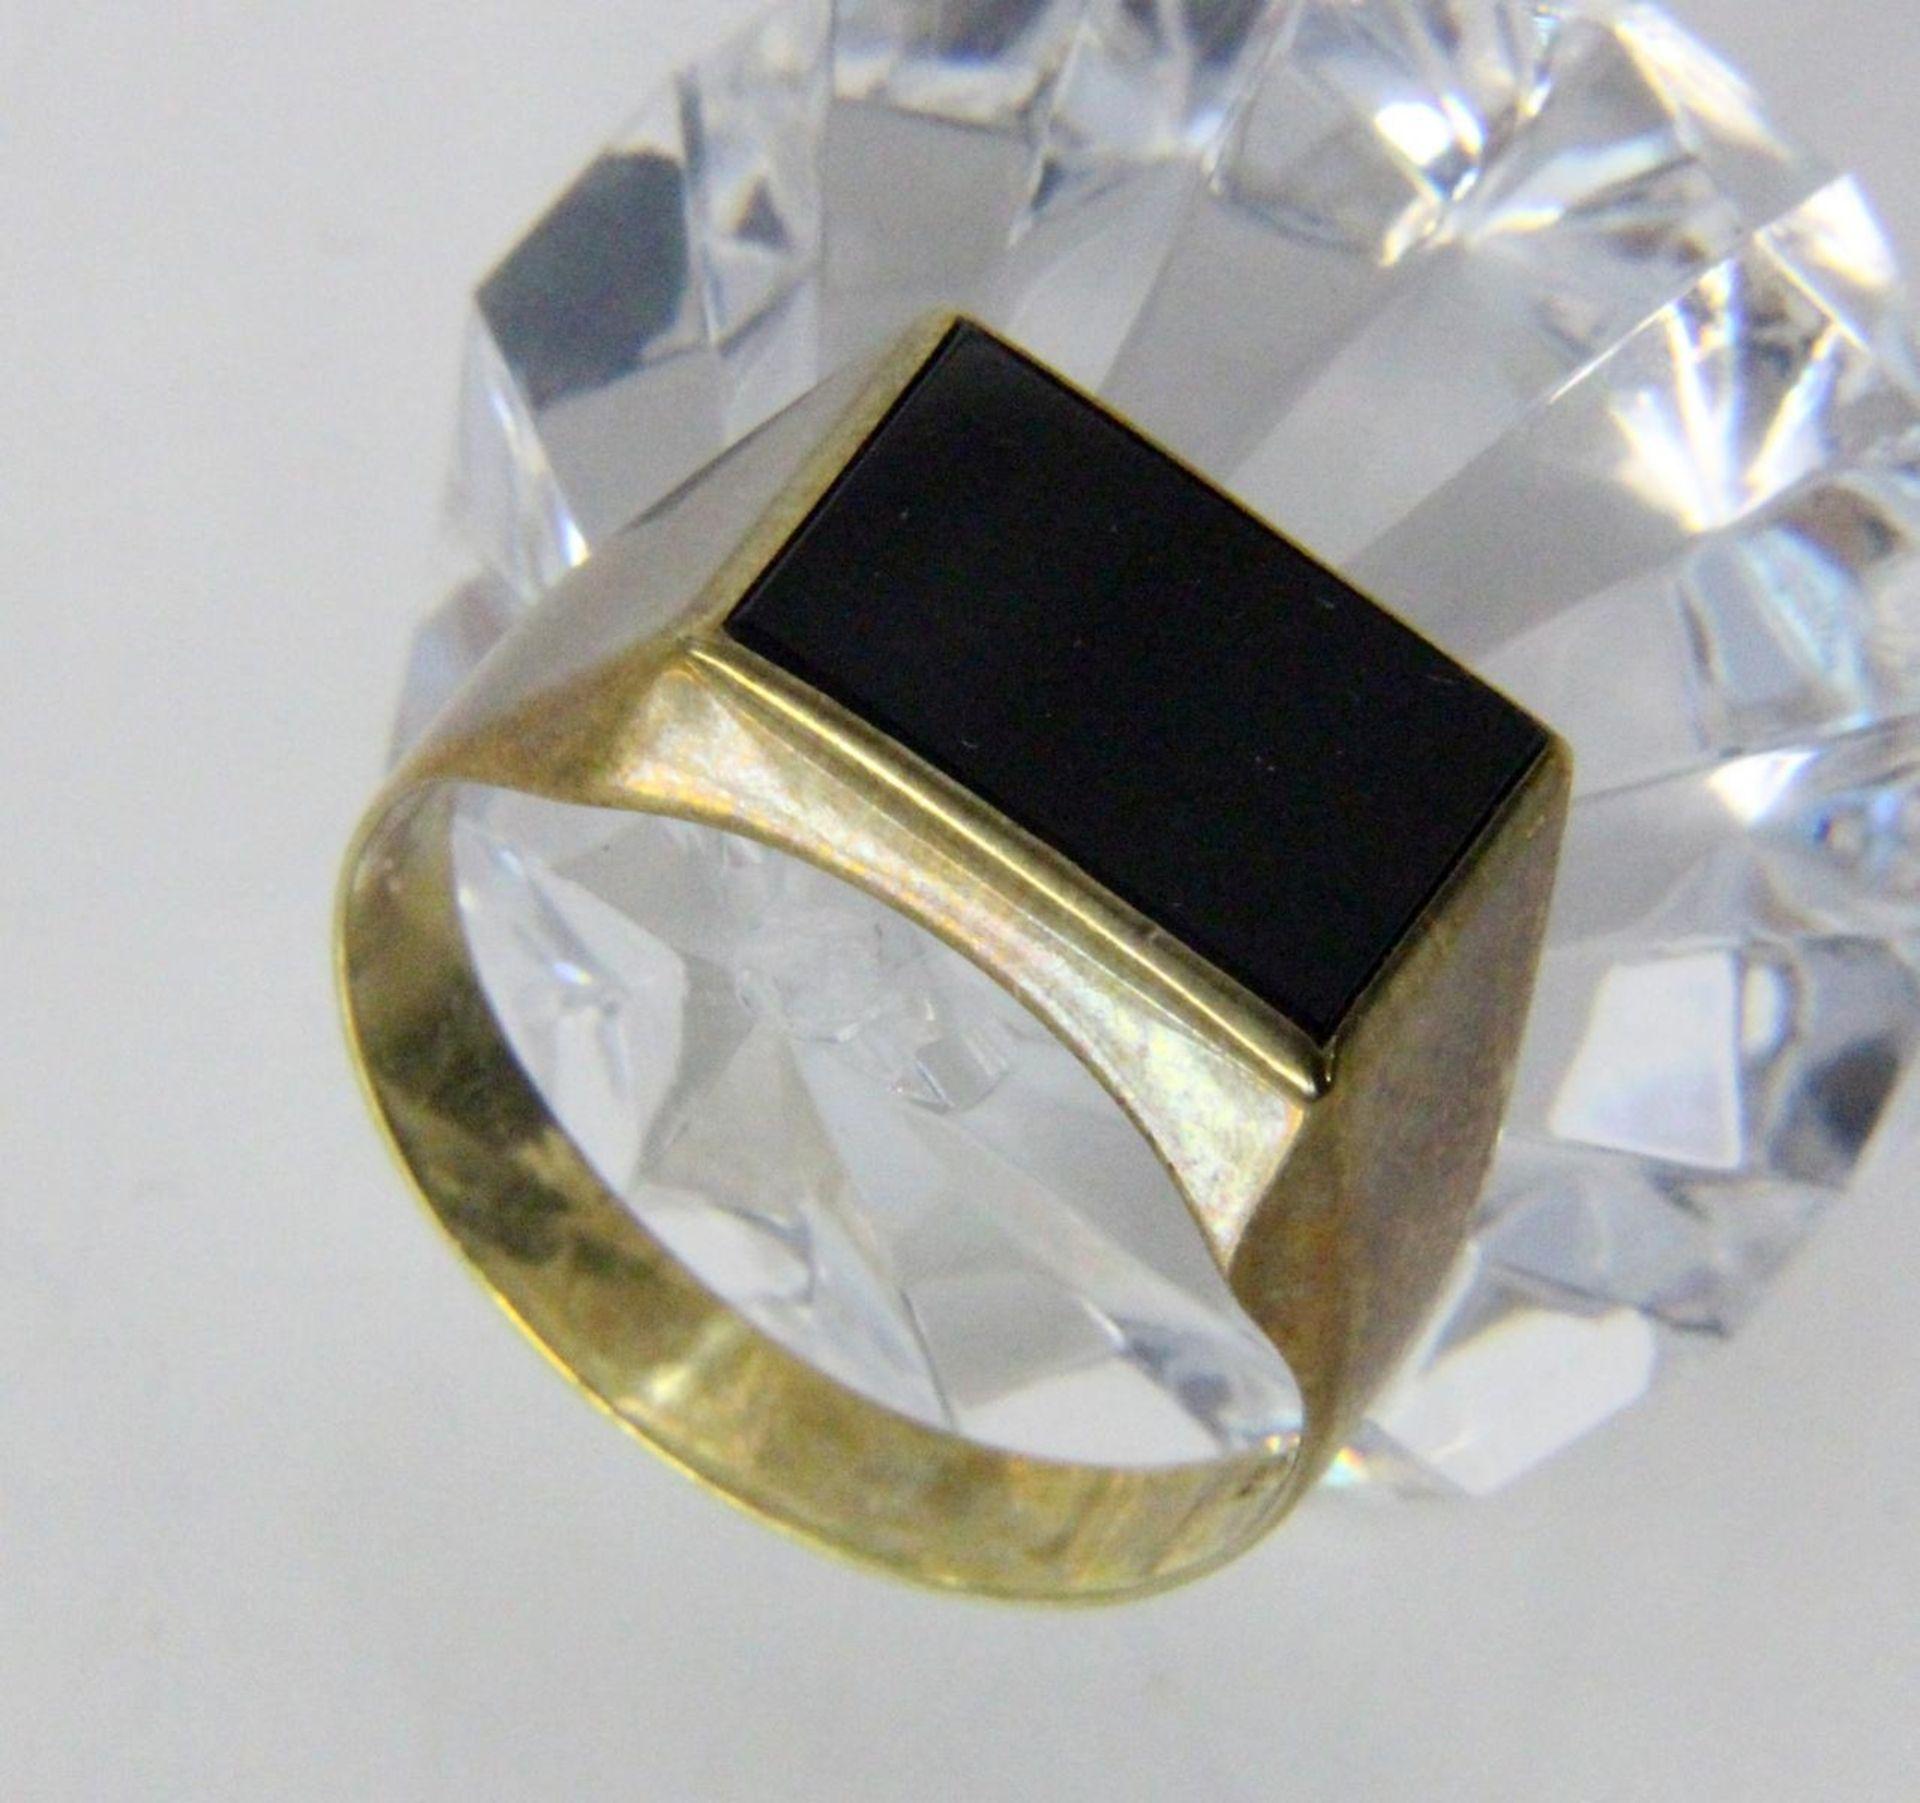 HERRENRING333/000 Gelbgold mit Onyx. Ringgr. 64, Brutto ca. 3gA MEN'S RING 333/000 yellow gold